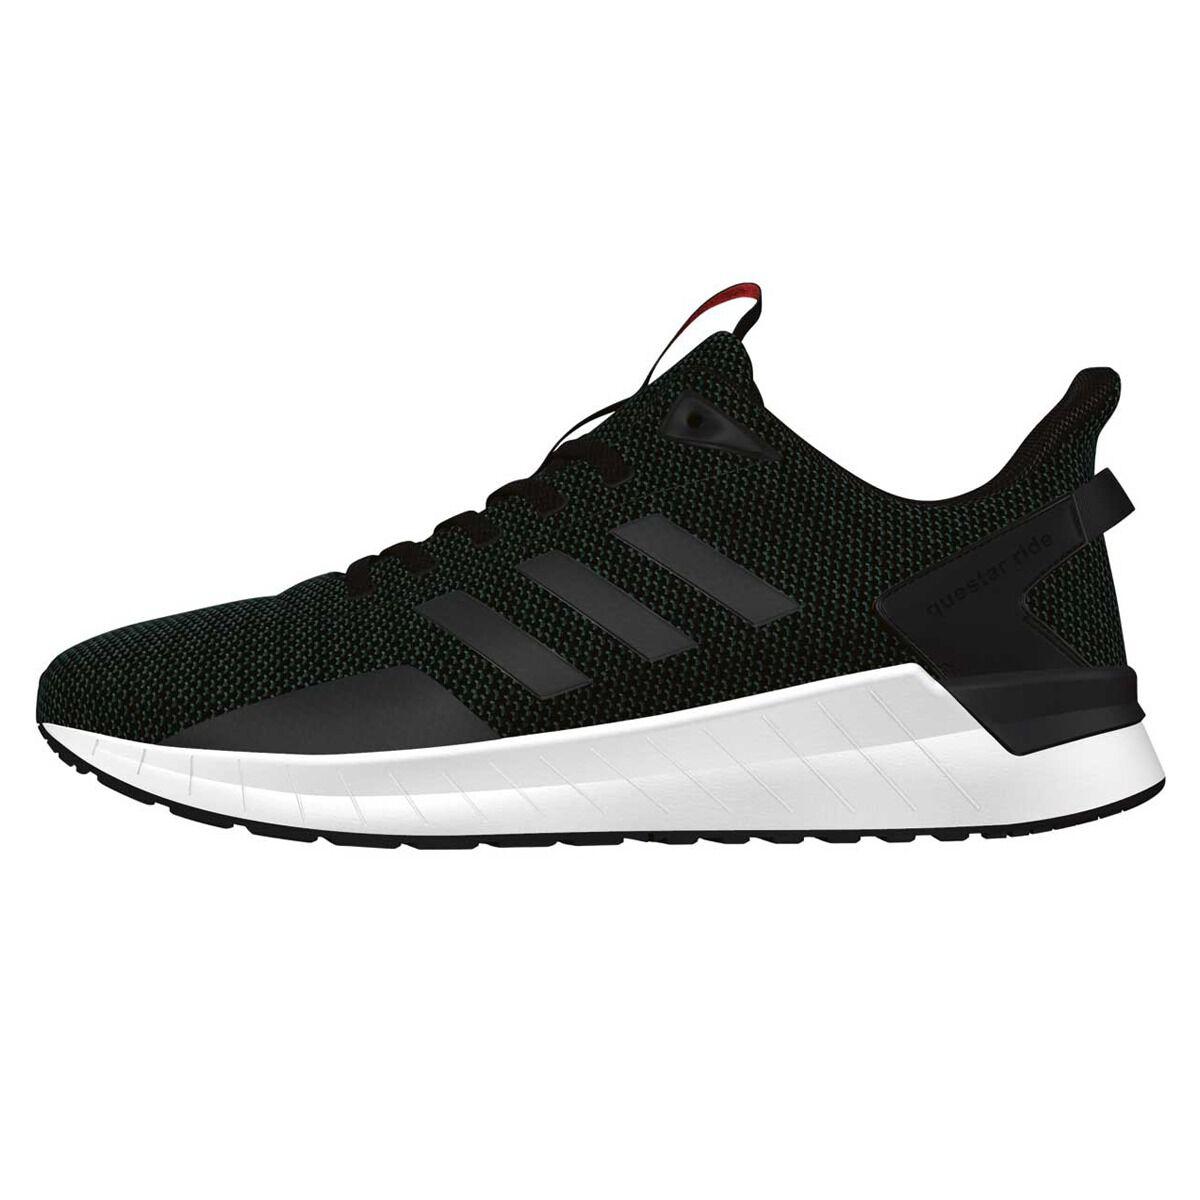 Questar Mens Shoes Running Ride Adidas qGSpzUVM